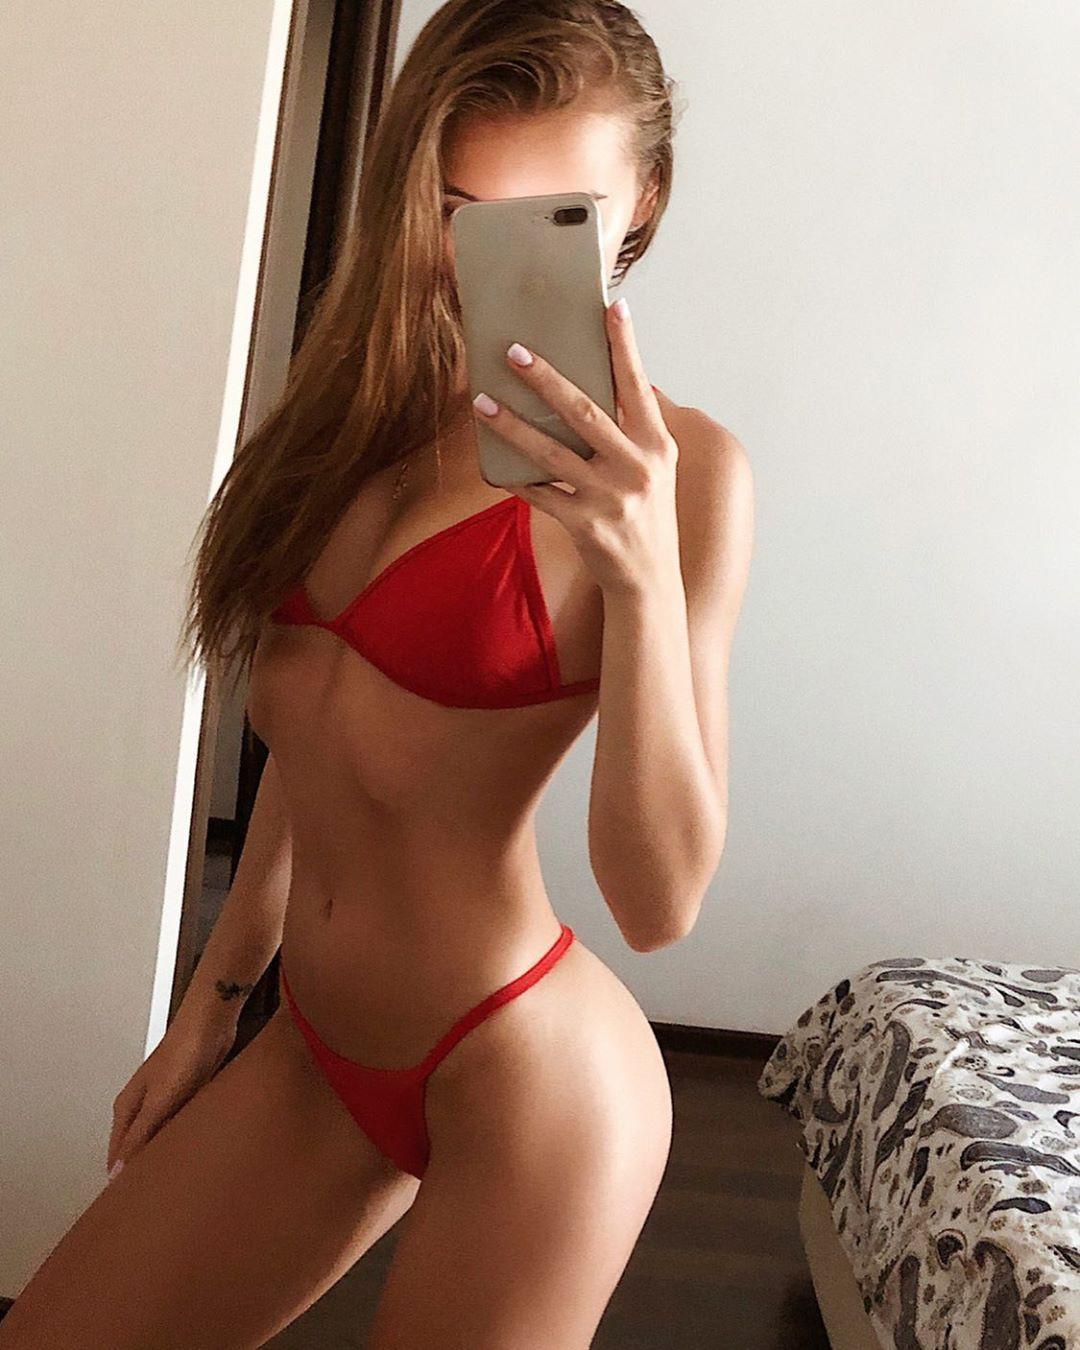 Galina Dub lingerie, bikini dress for women, hot legs